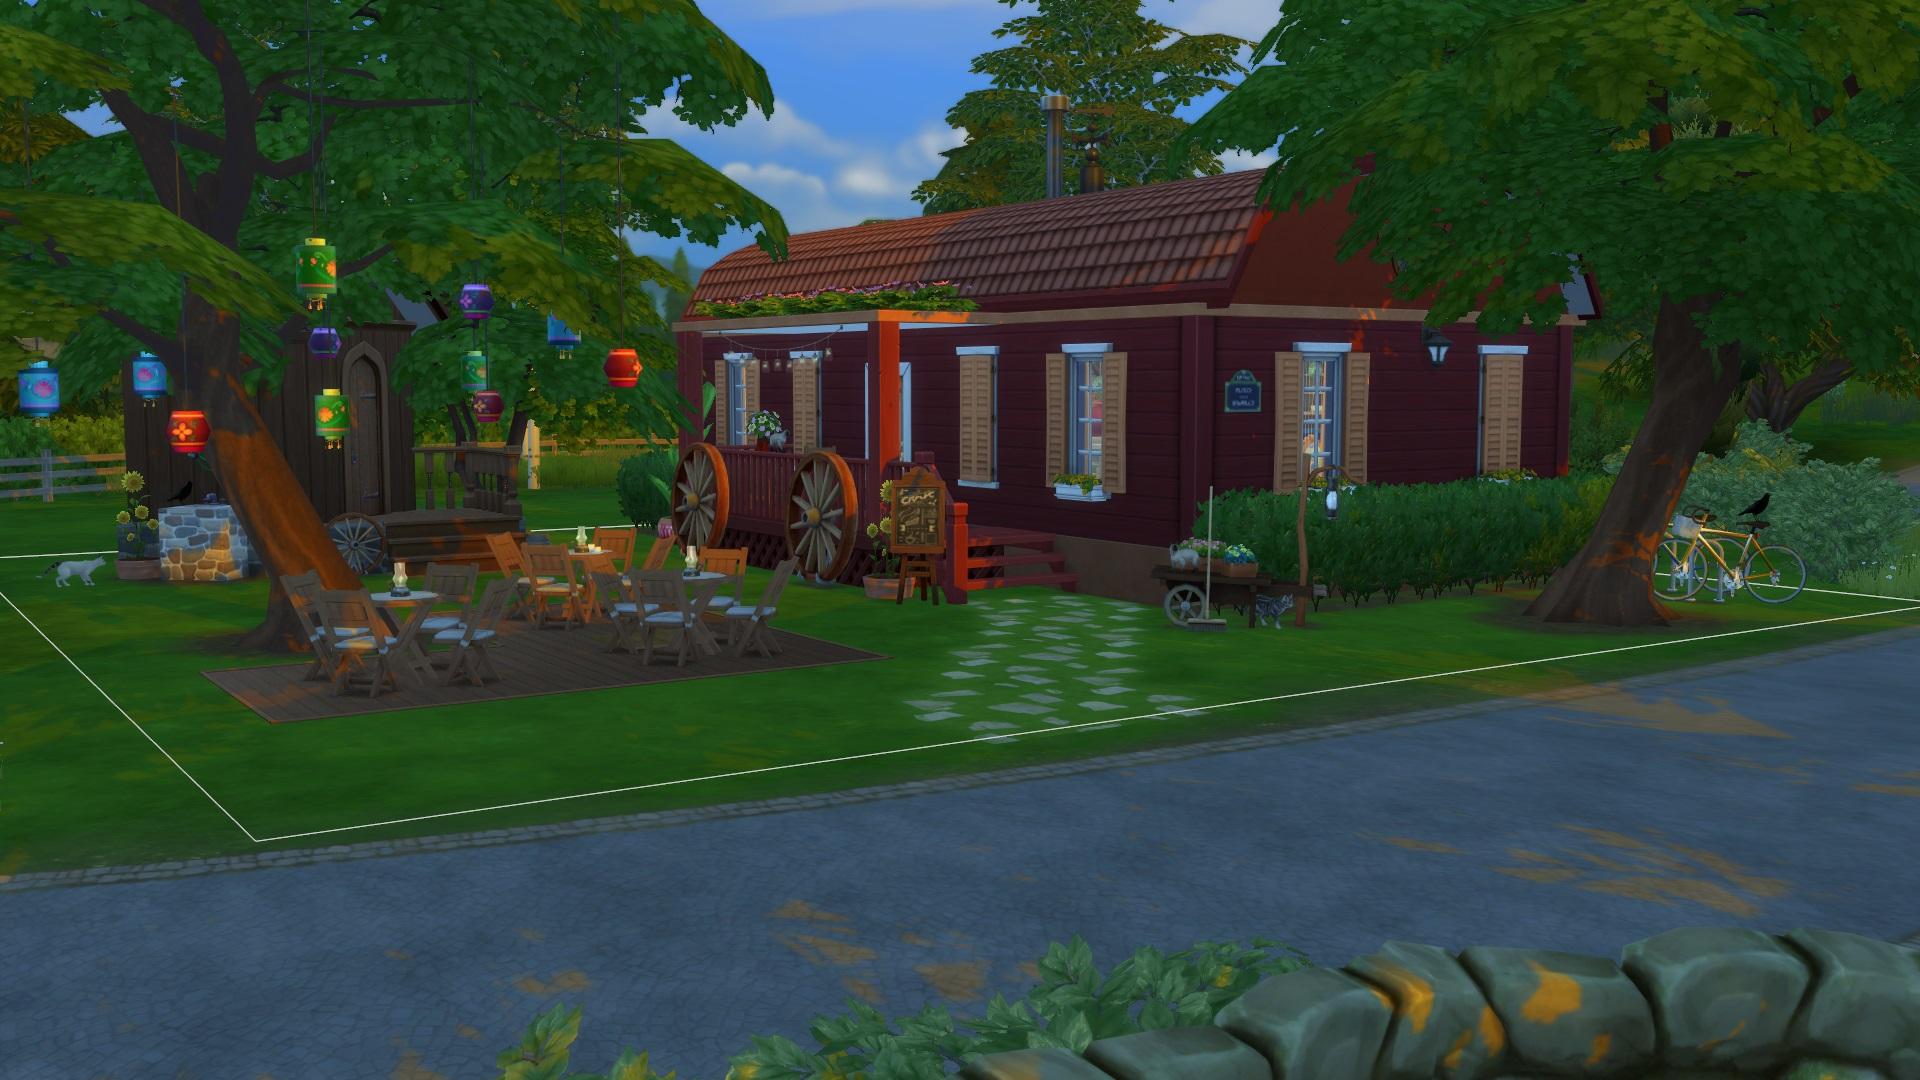 Sims 2 genitals mod hot coffee porncraft galleries